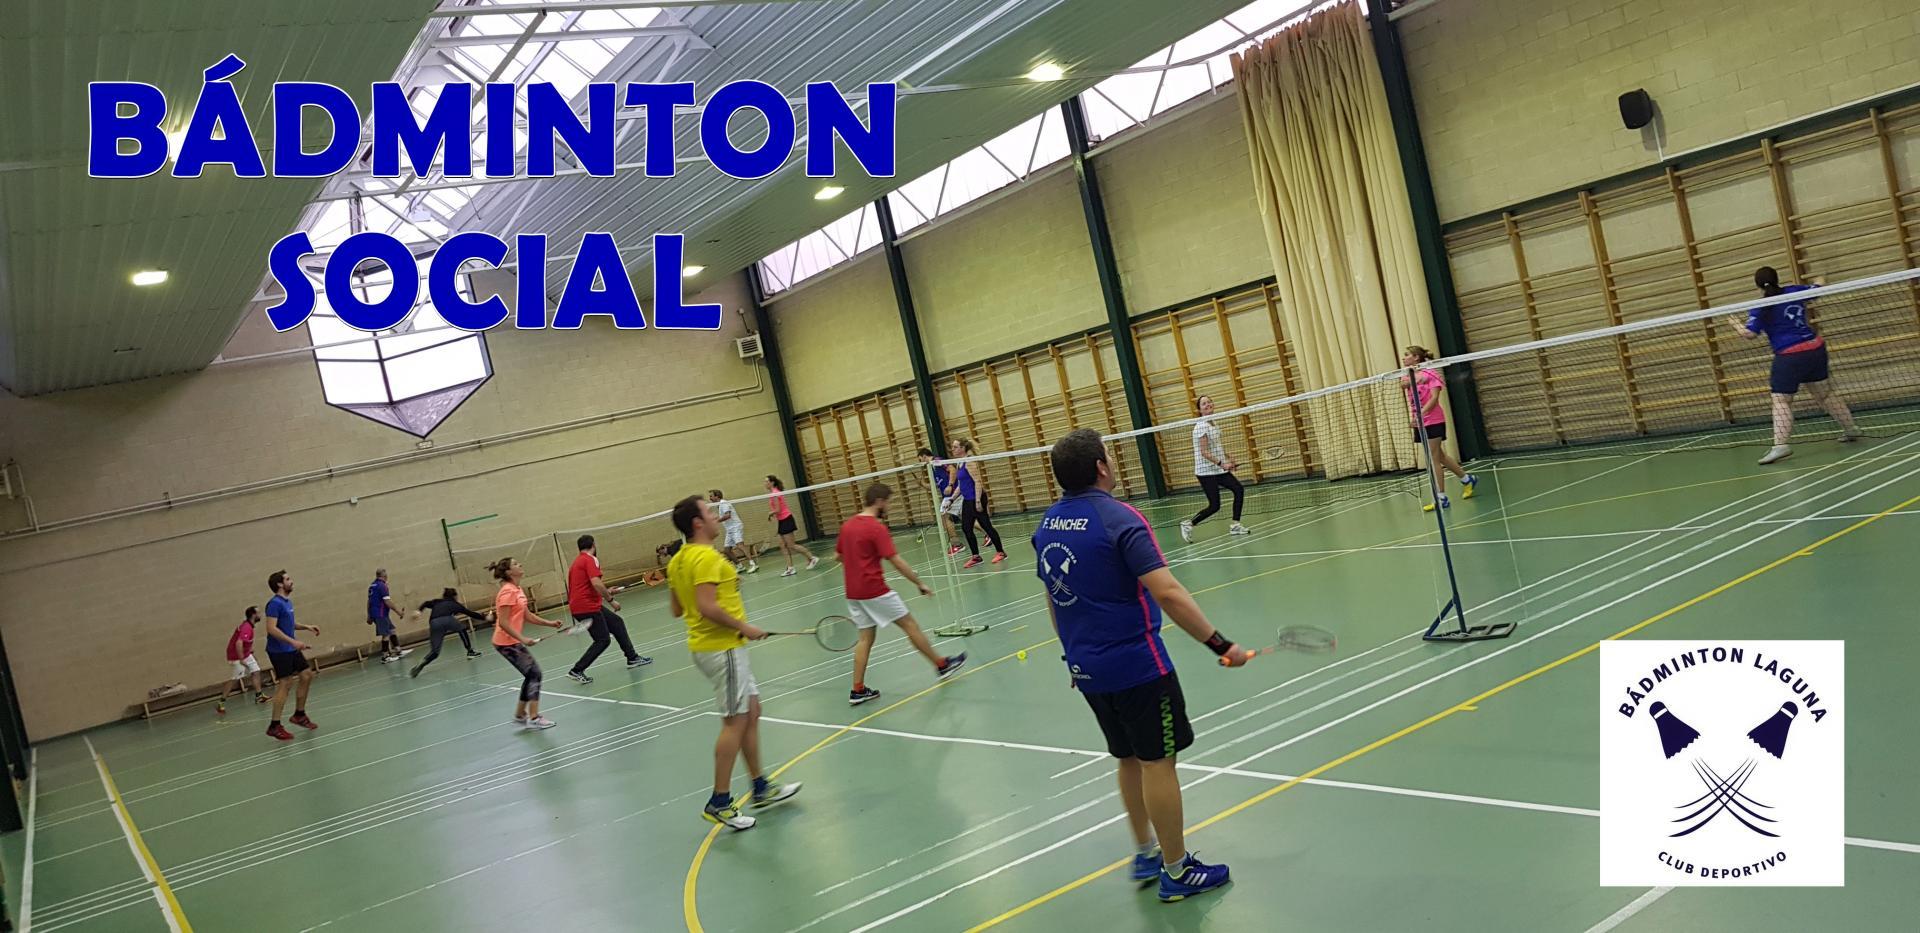 Badminton social 1